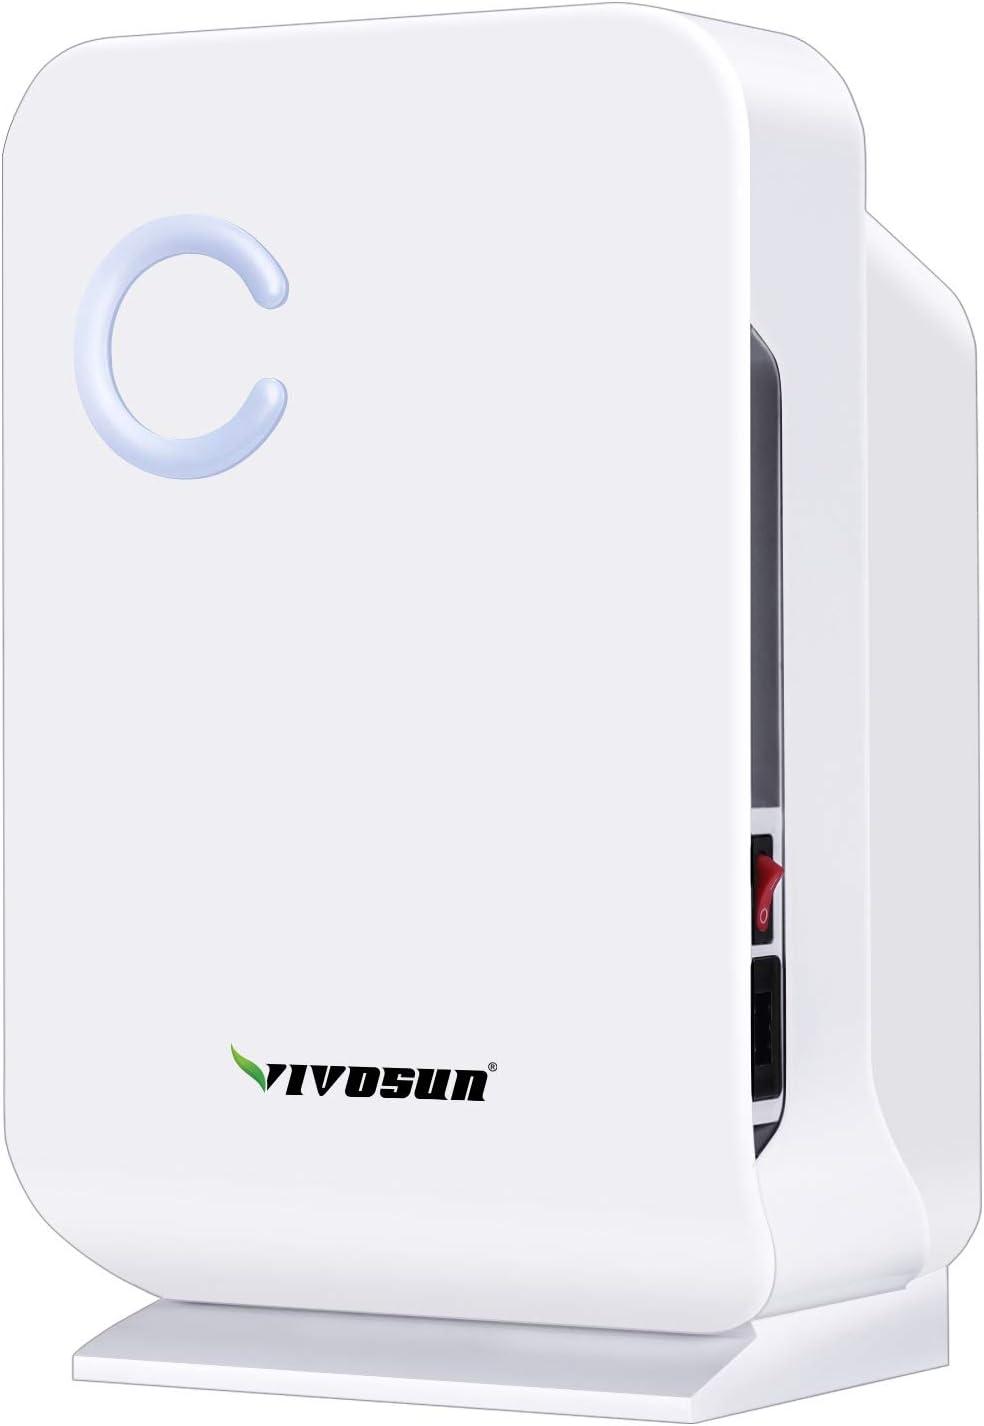 VIVOSUN Small Space Mini Dehumidifier for Grow Tent Review